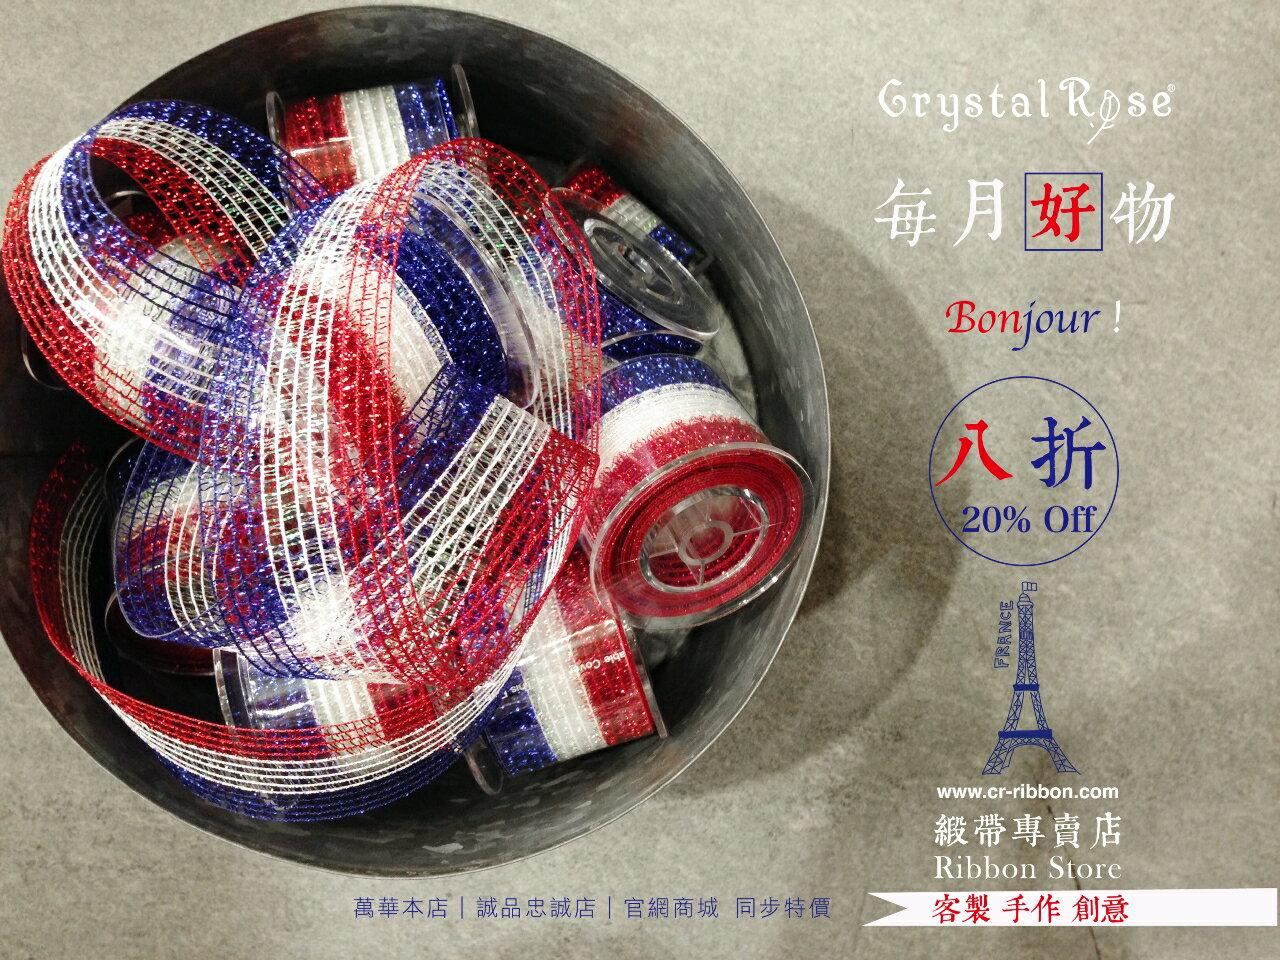 【Crystal Rose緞帶專賣店】法國香頌彩條金蔥 0